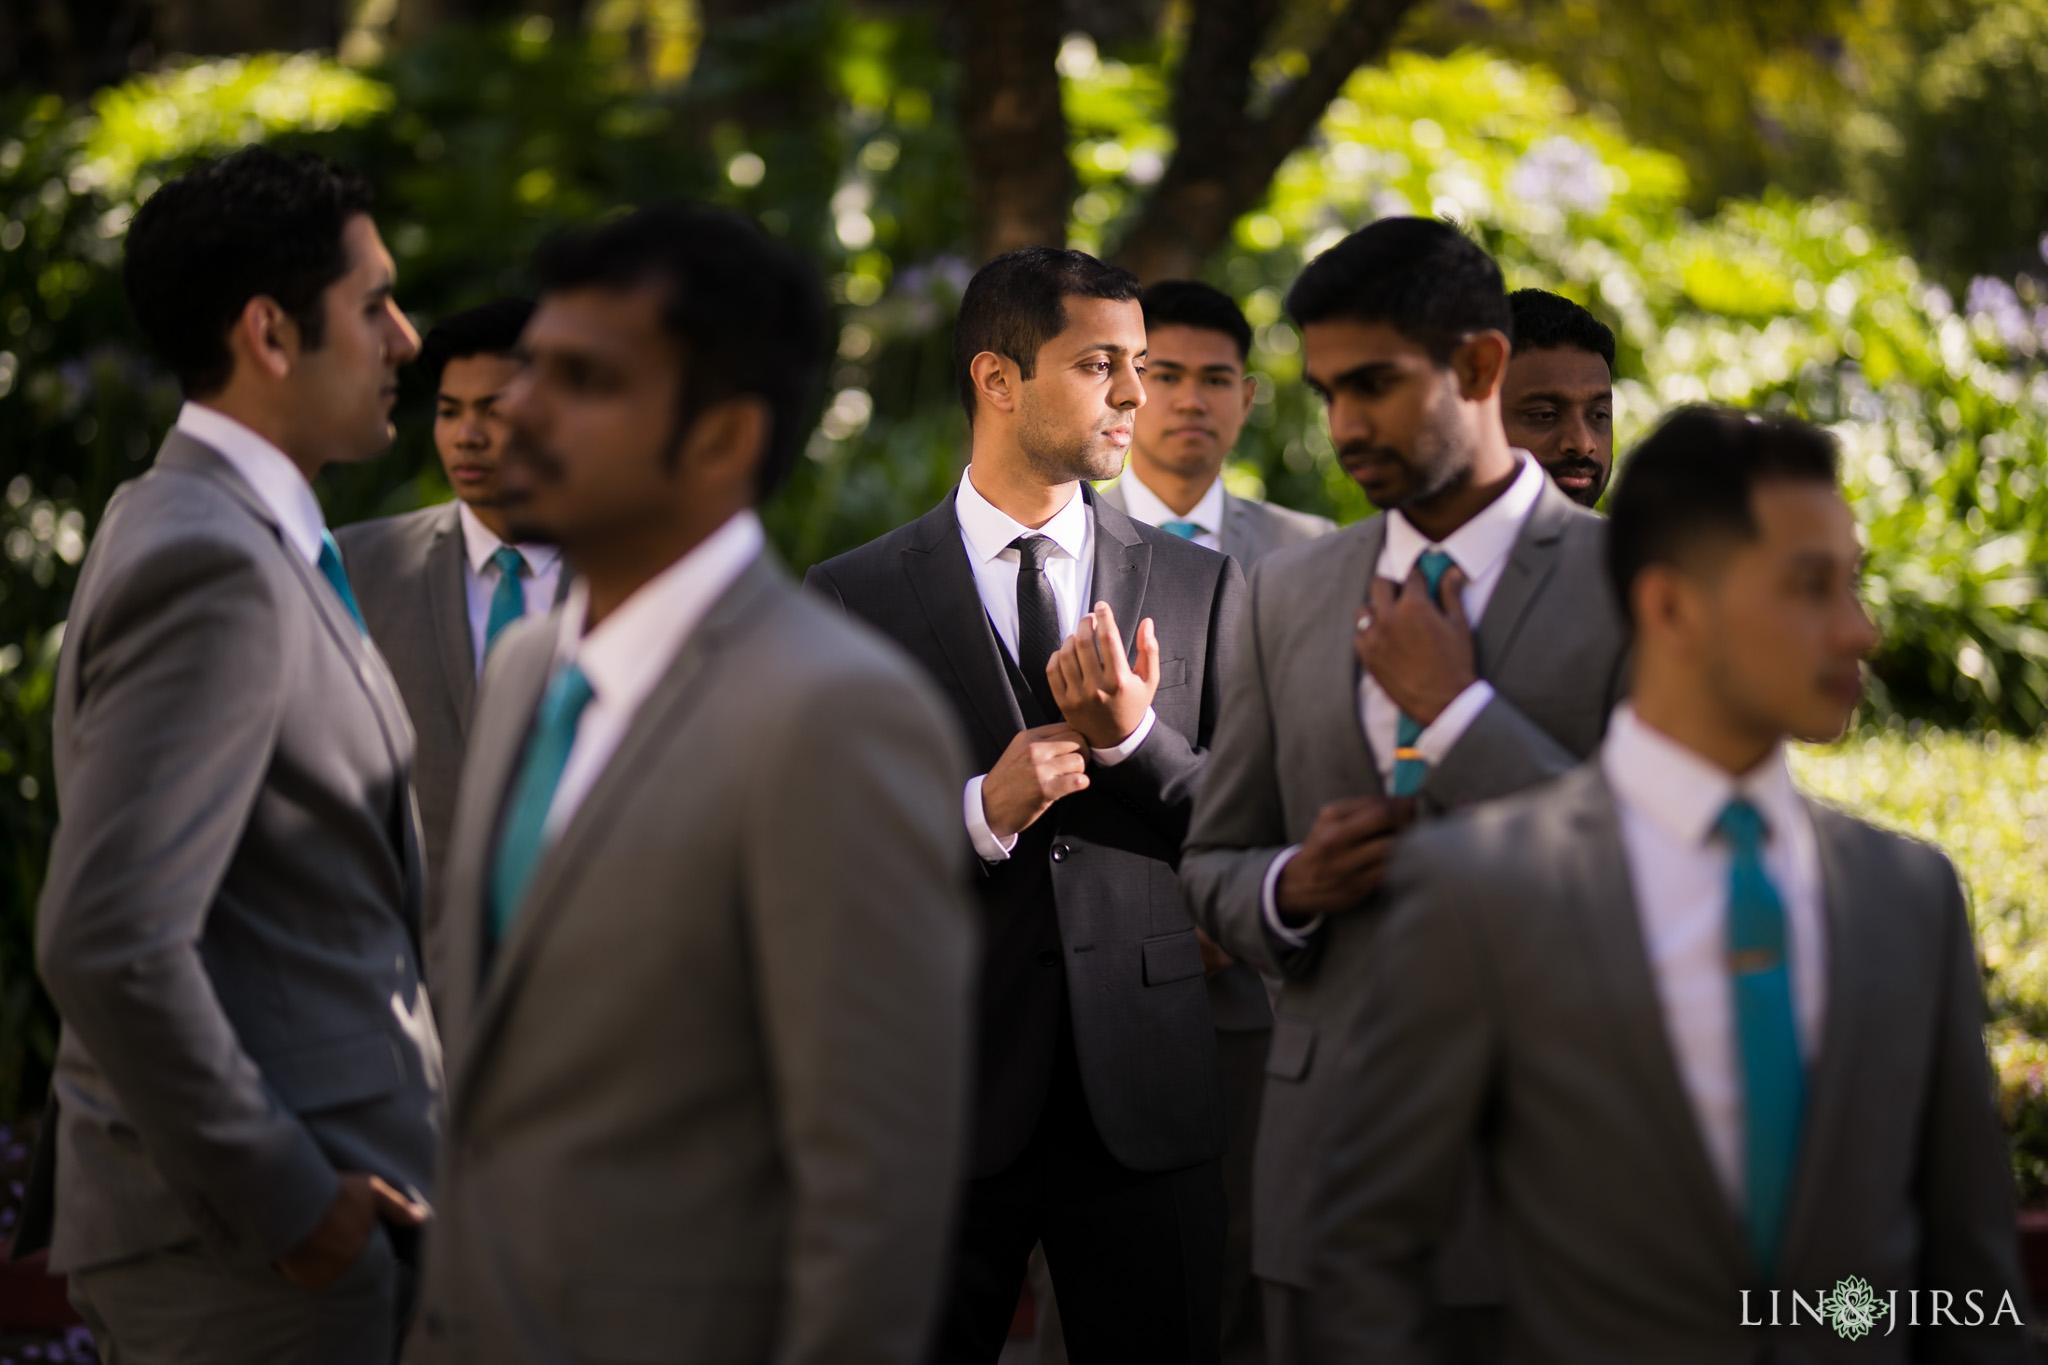 12 sheraton fairplex inland empire indian wedding photography